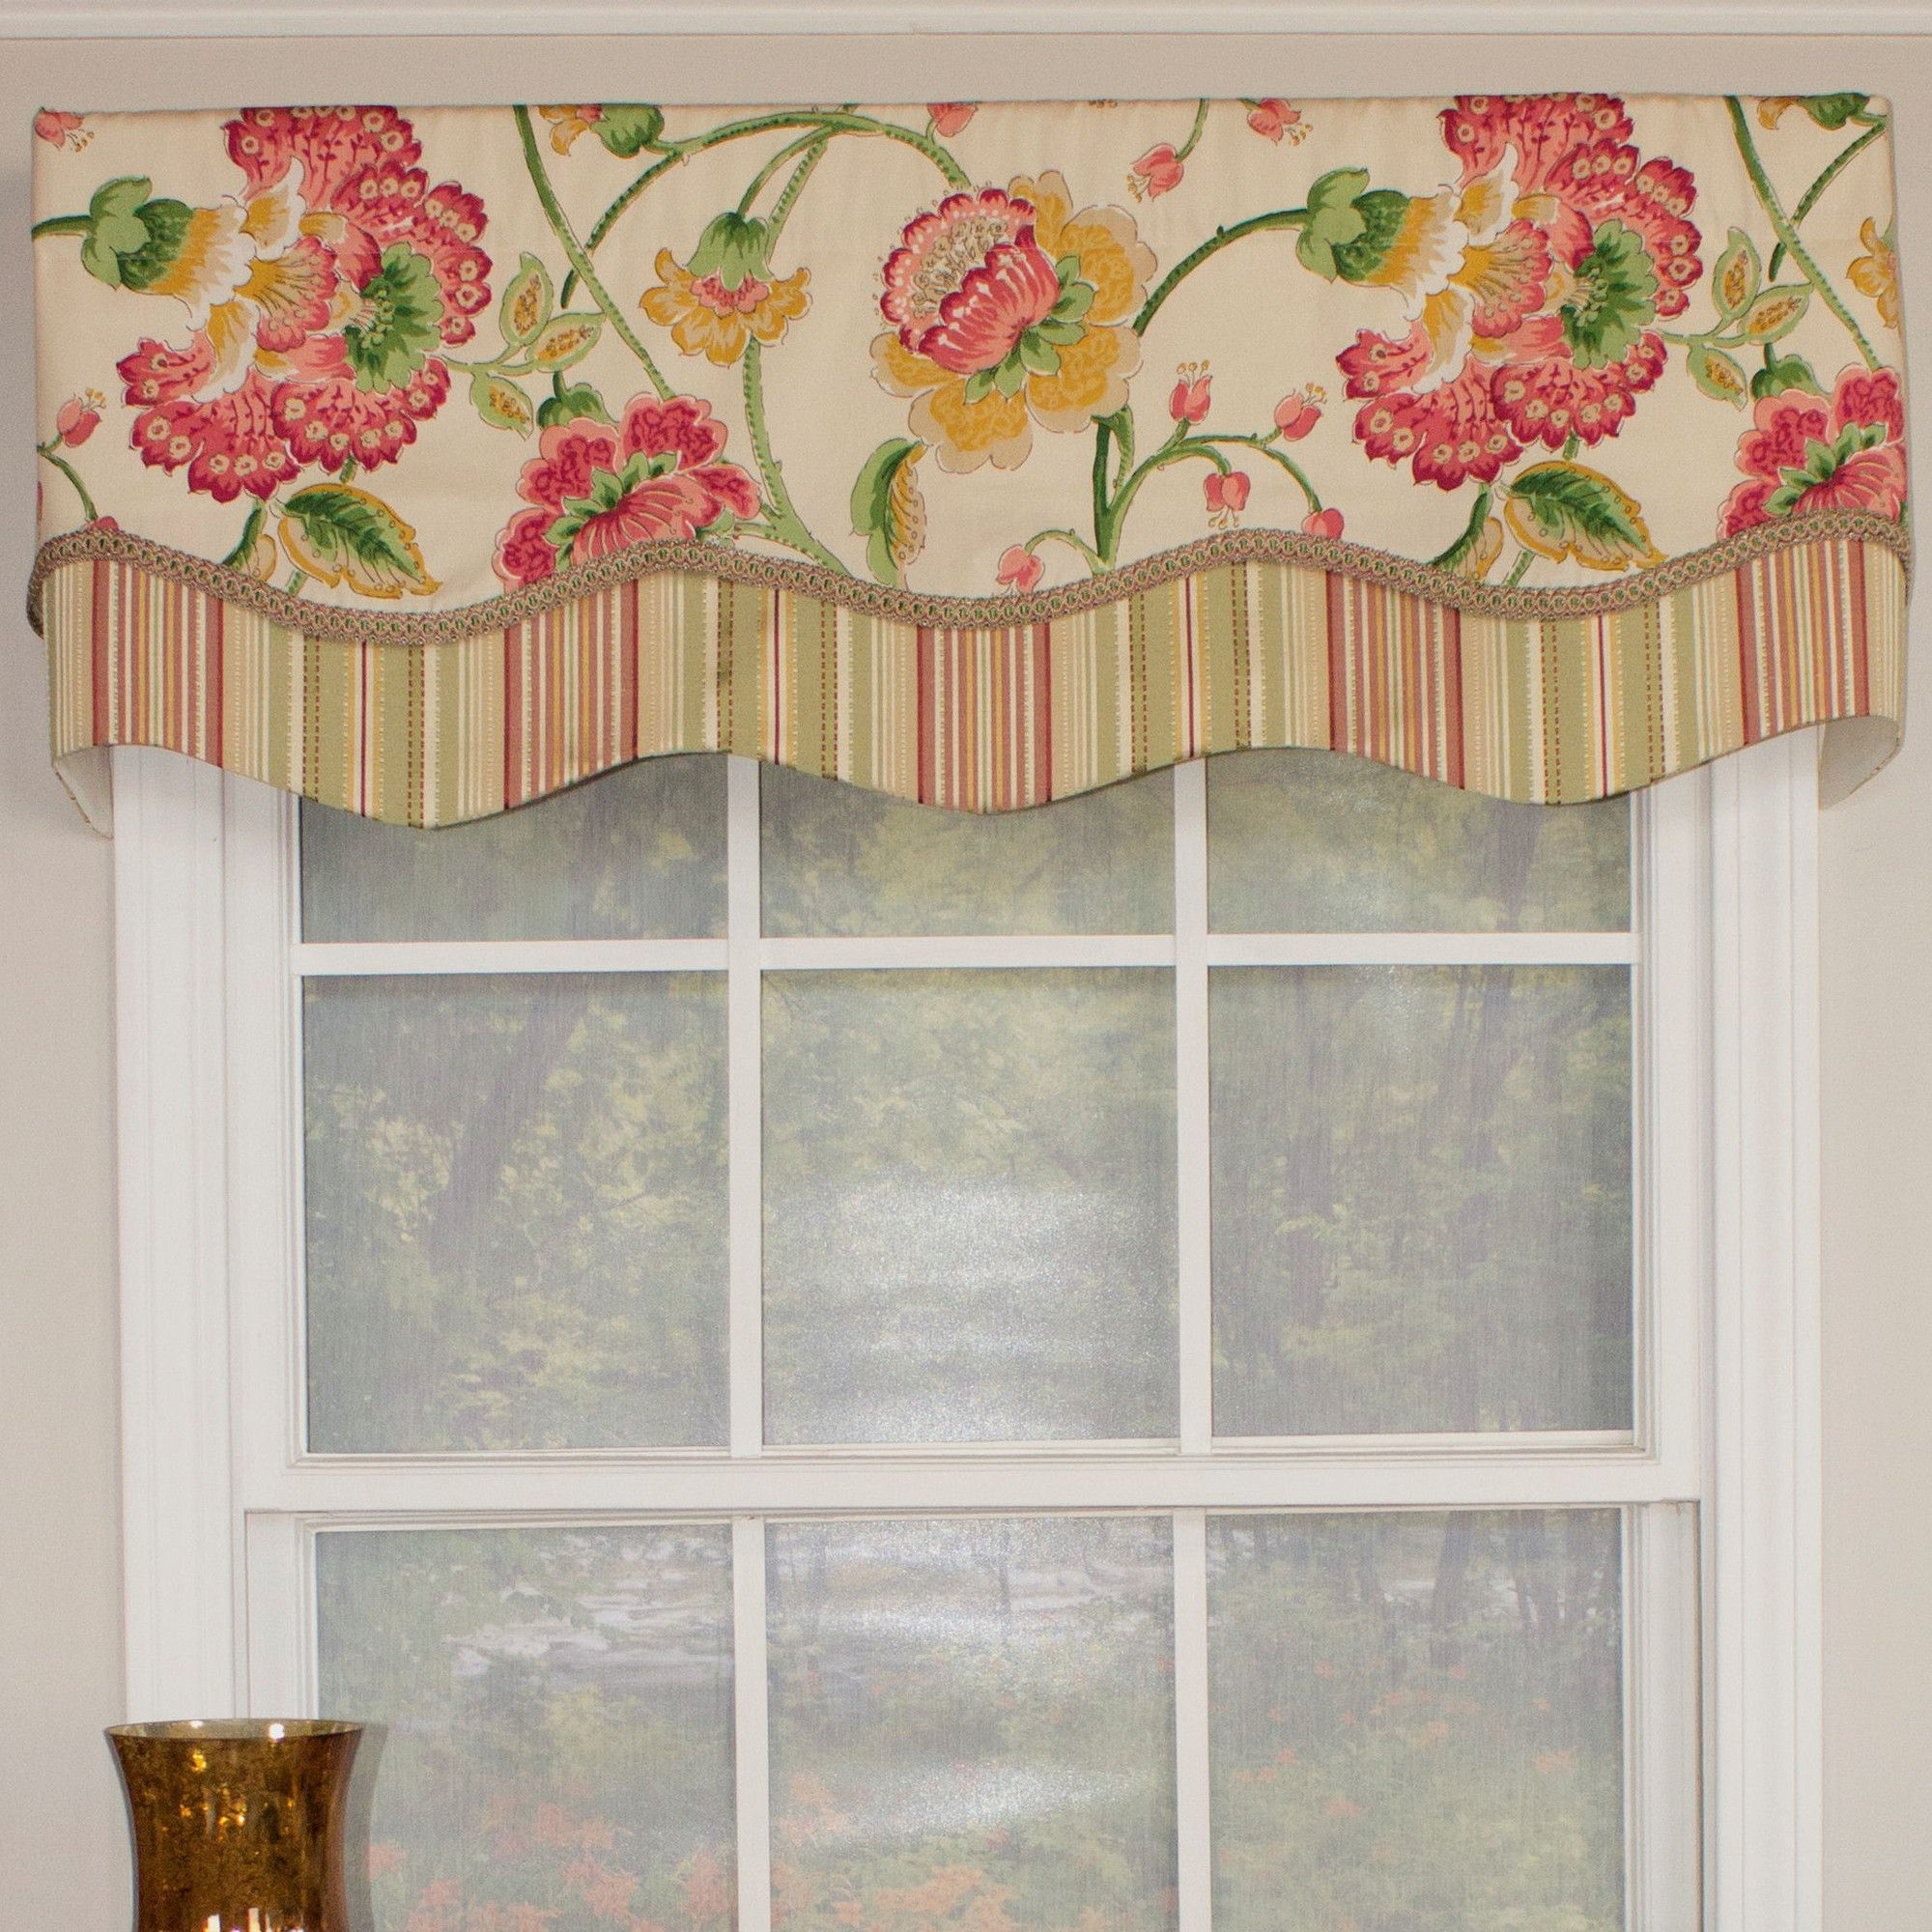 Flower Frenzie Glory 50 Cornice Curtain Valance